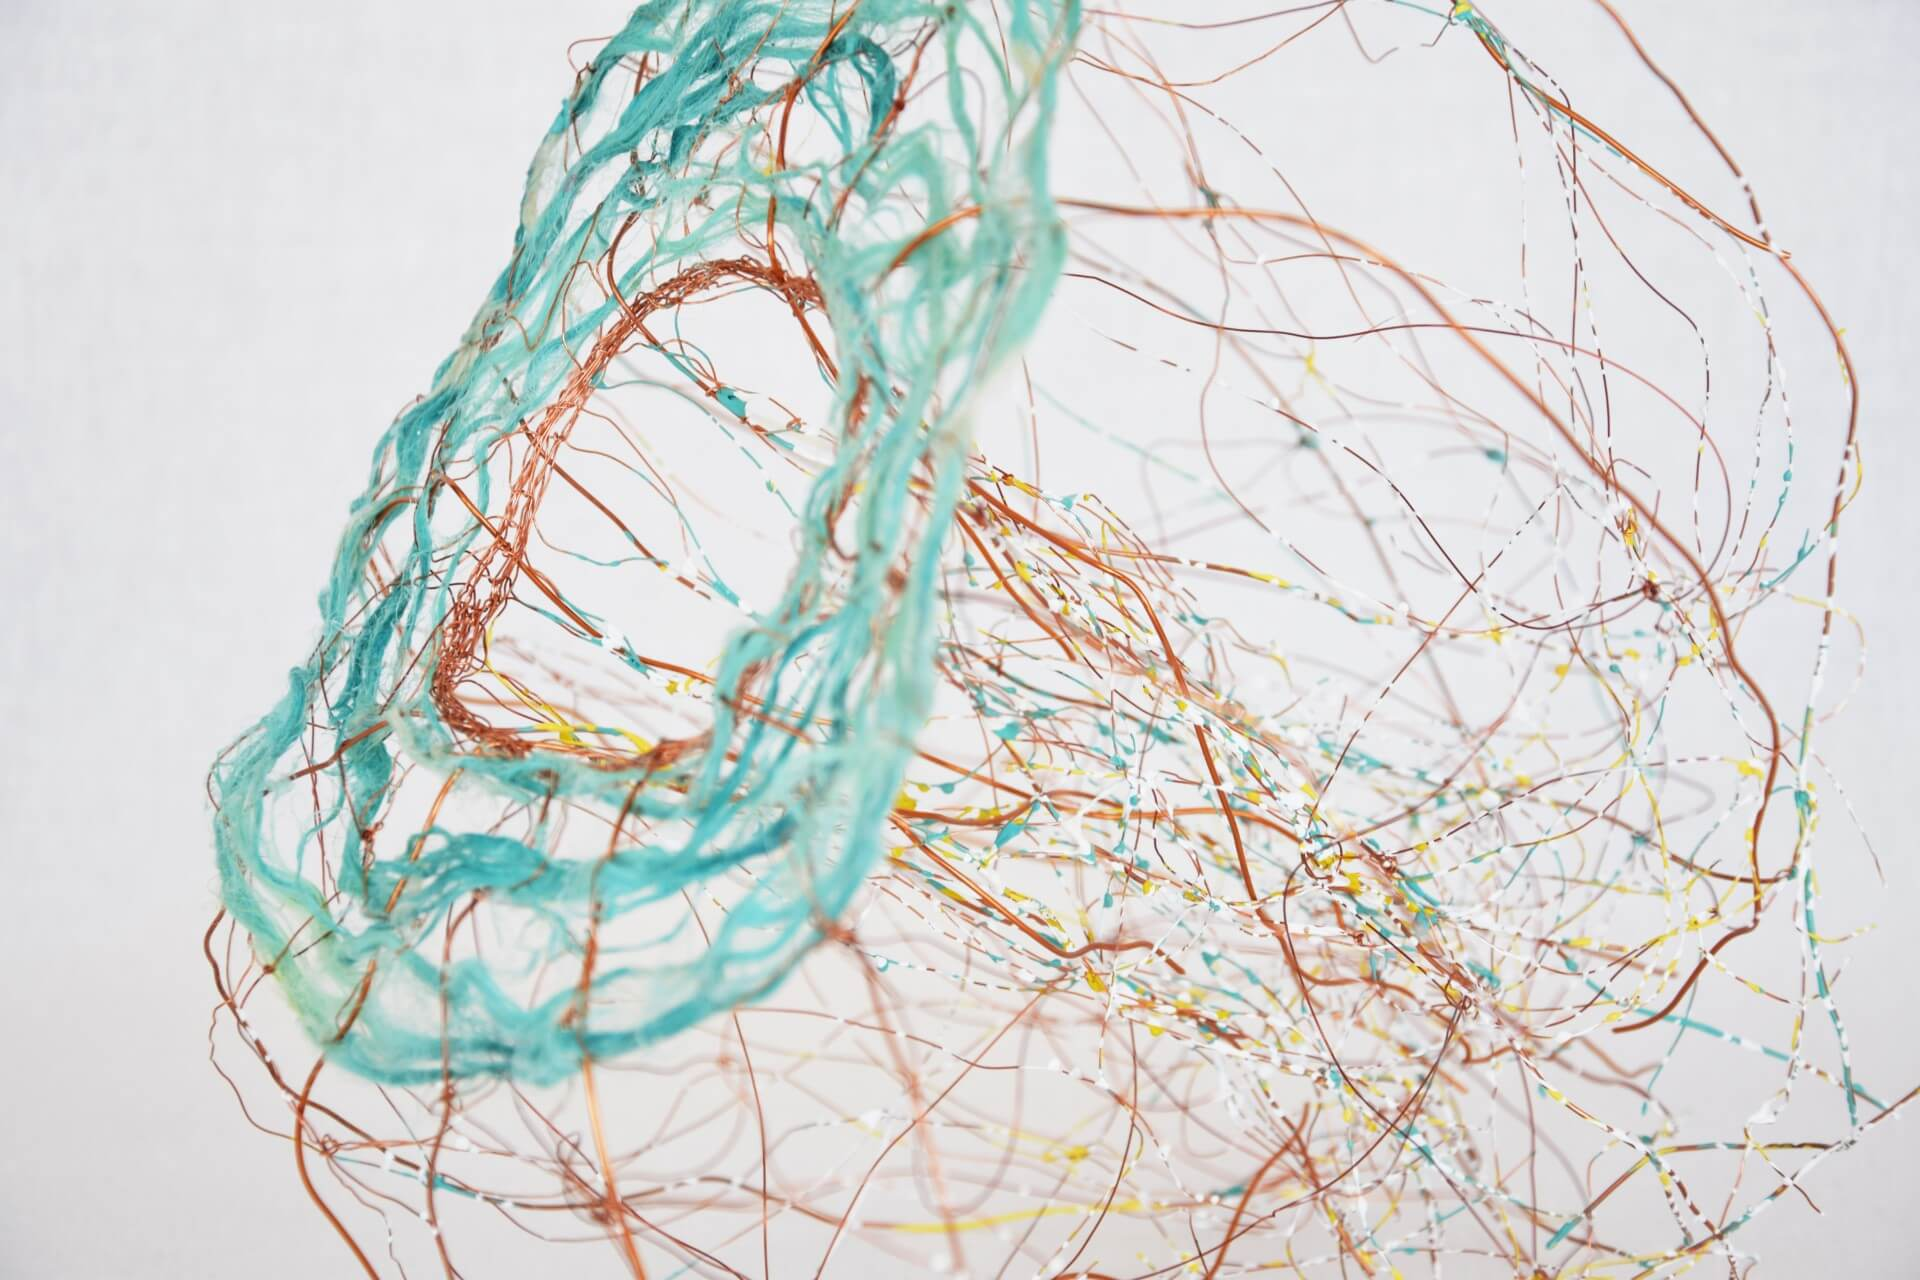 Patrizia-Polese-Textil-Art-Fiber-Iris-slides